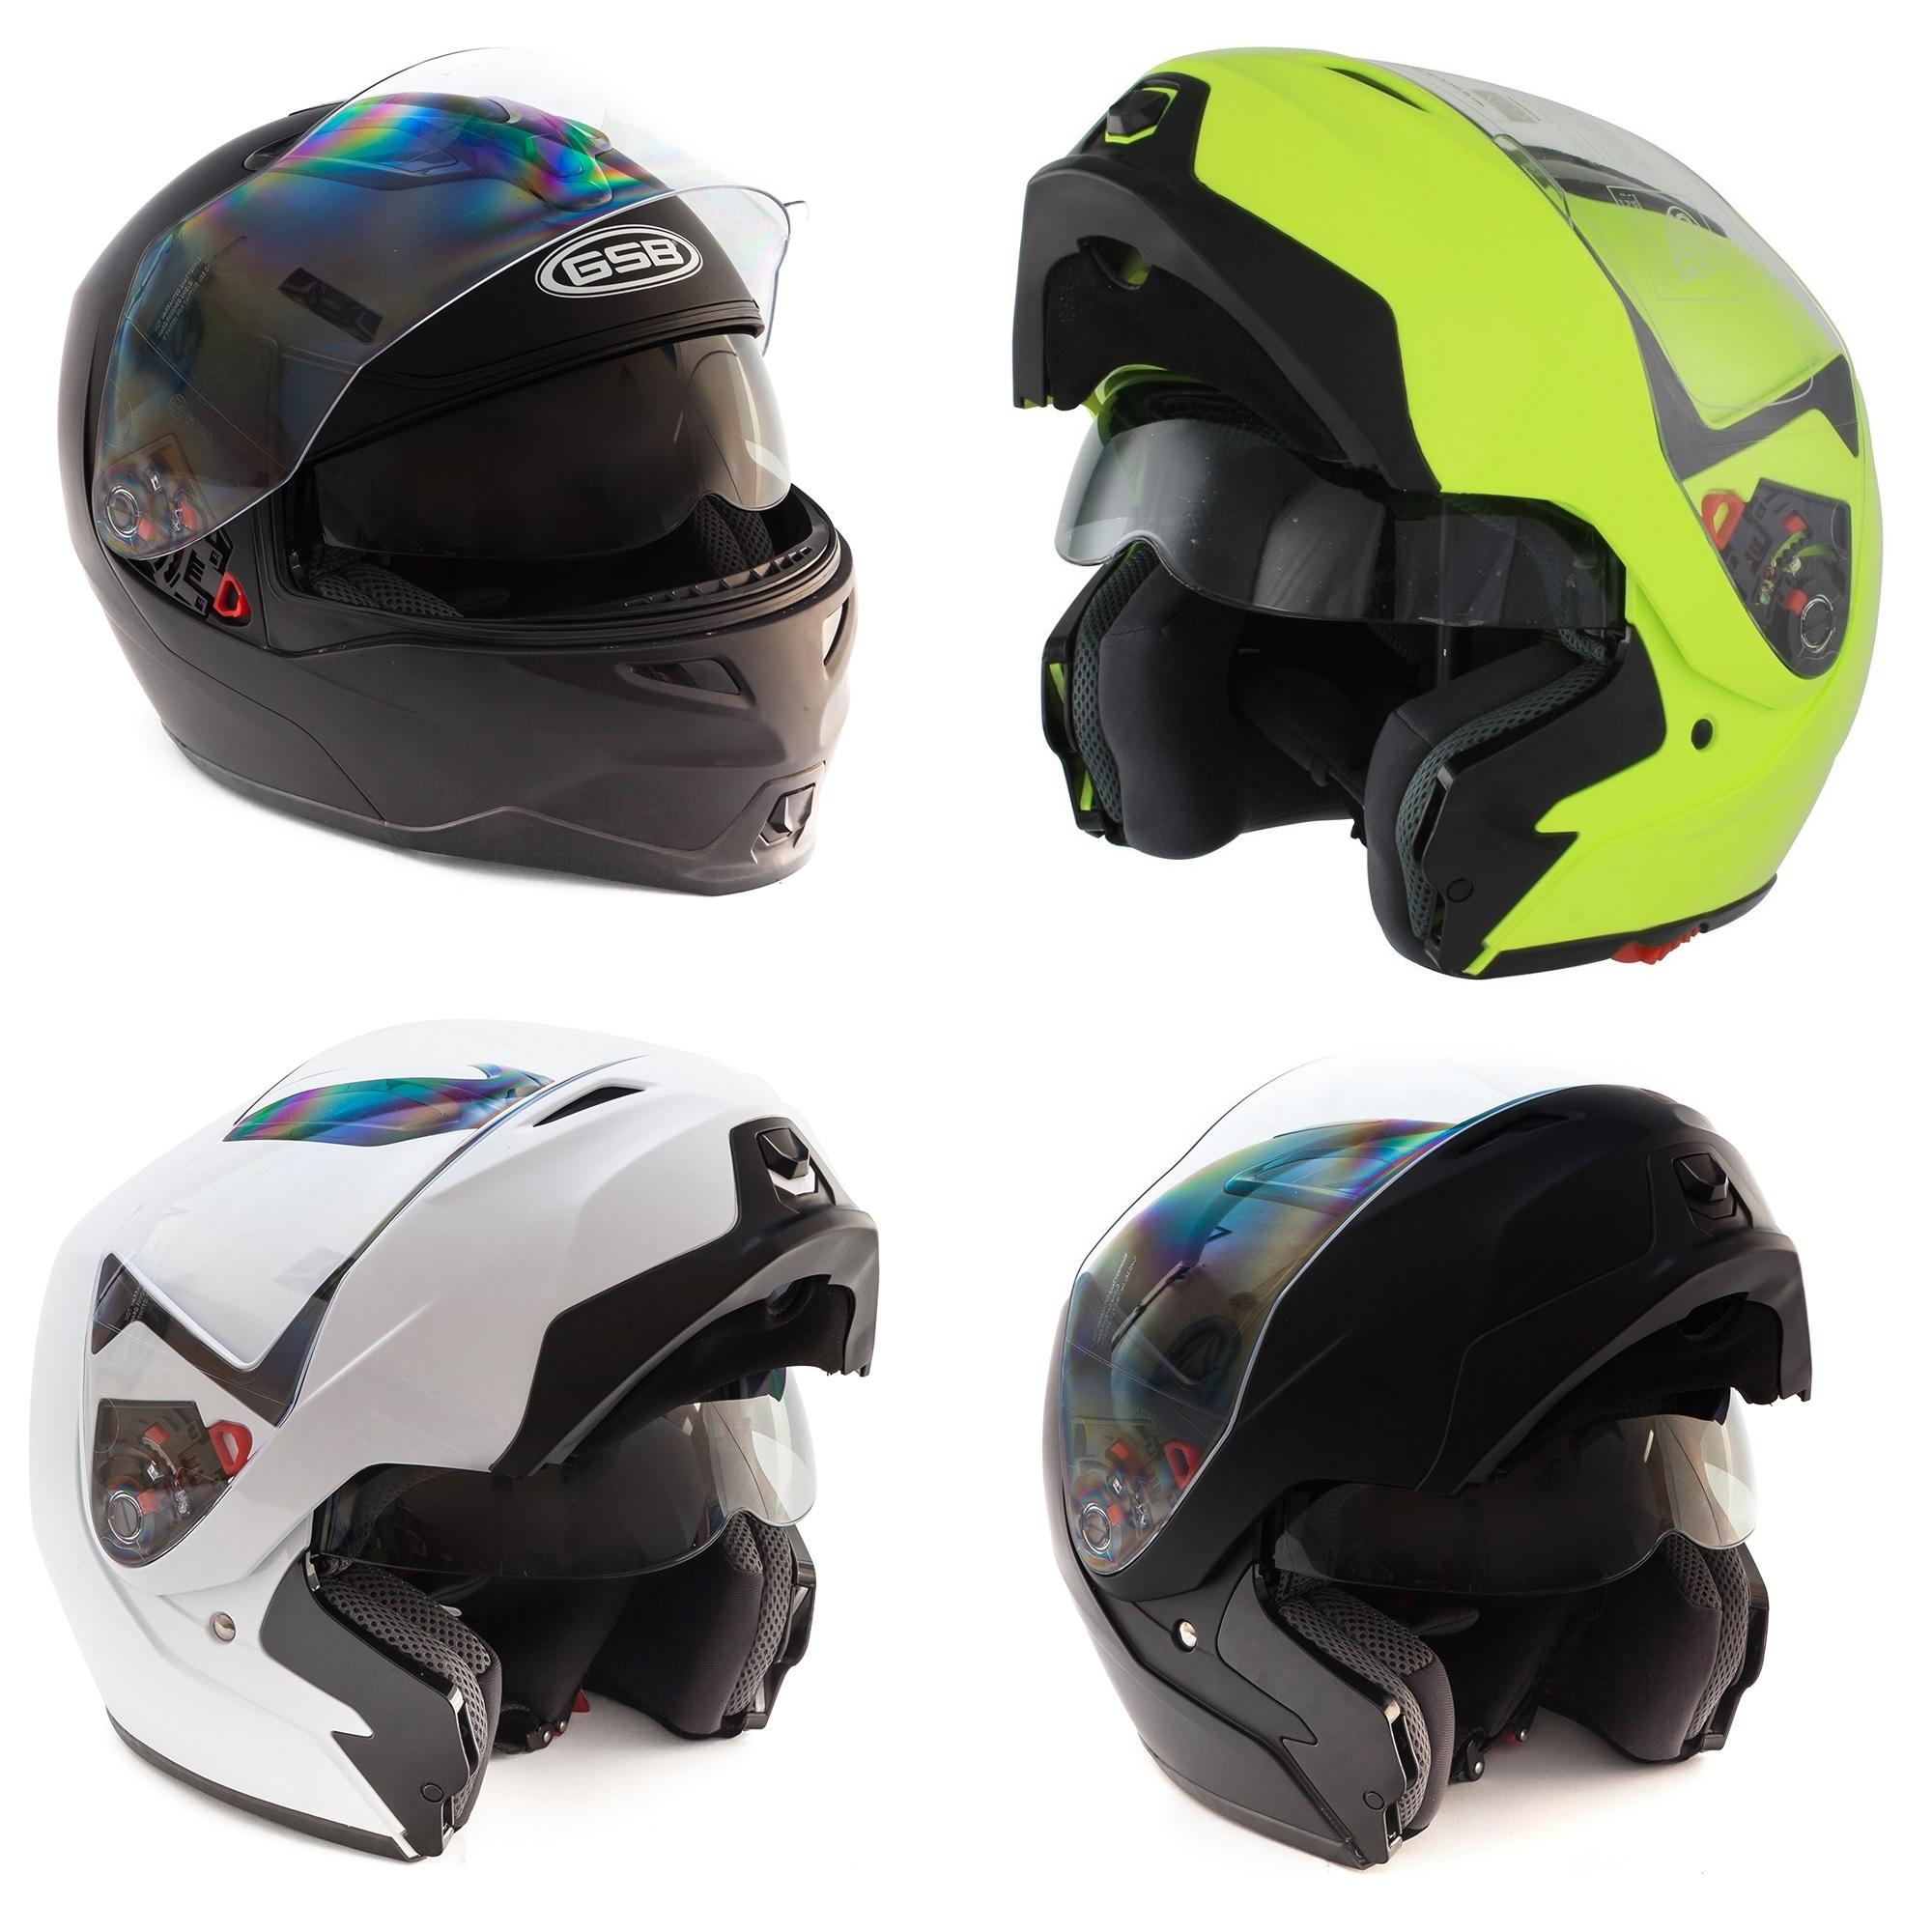 GSB G-339 Plain Helmet